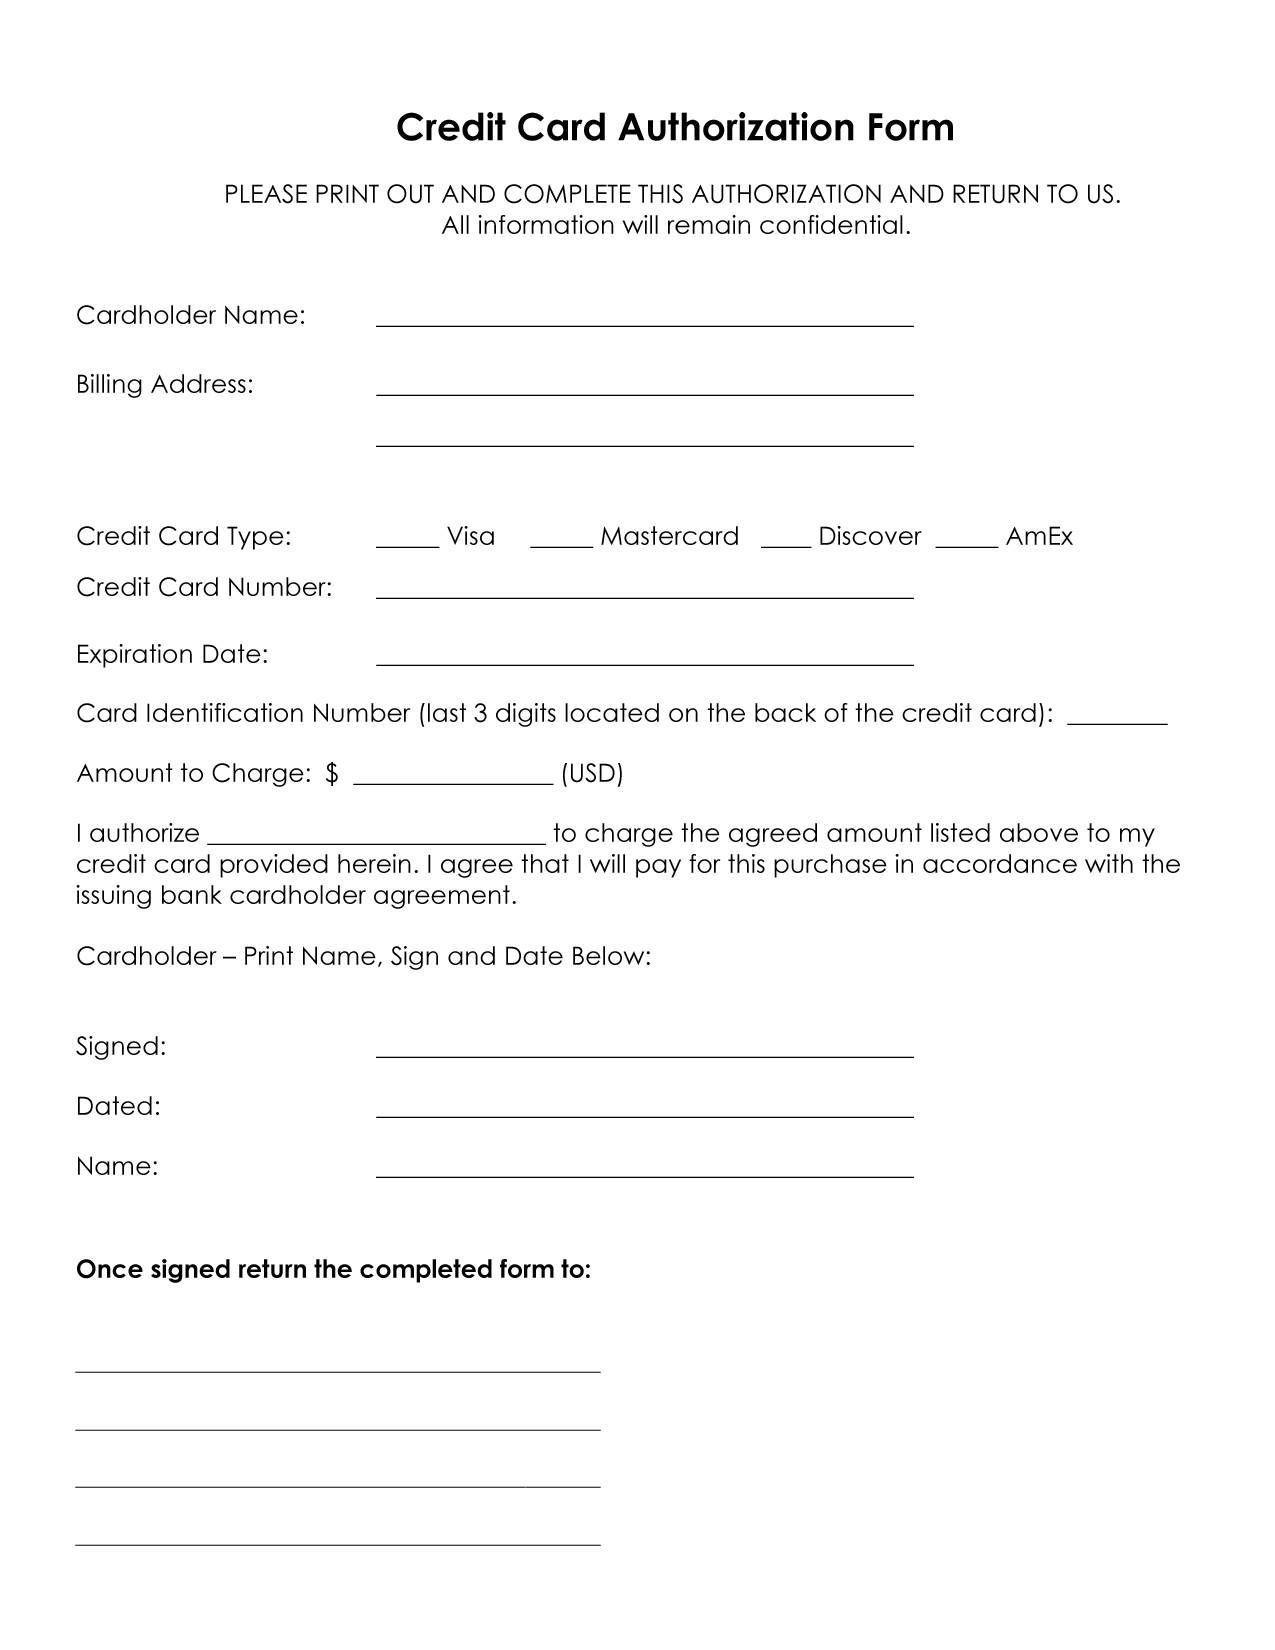 Kreditkarte Design Kreditkarte Credit Card Authorization Form Template Credit Card With Regard To Credit Card Images Credit Card Pictures Credit Card Design